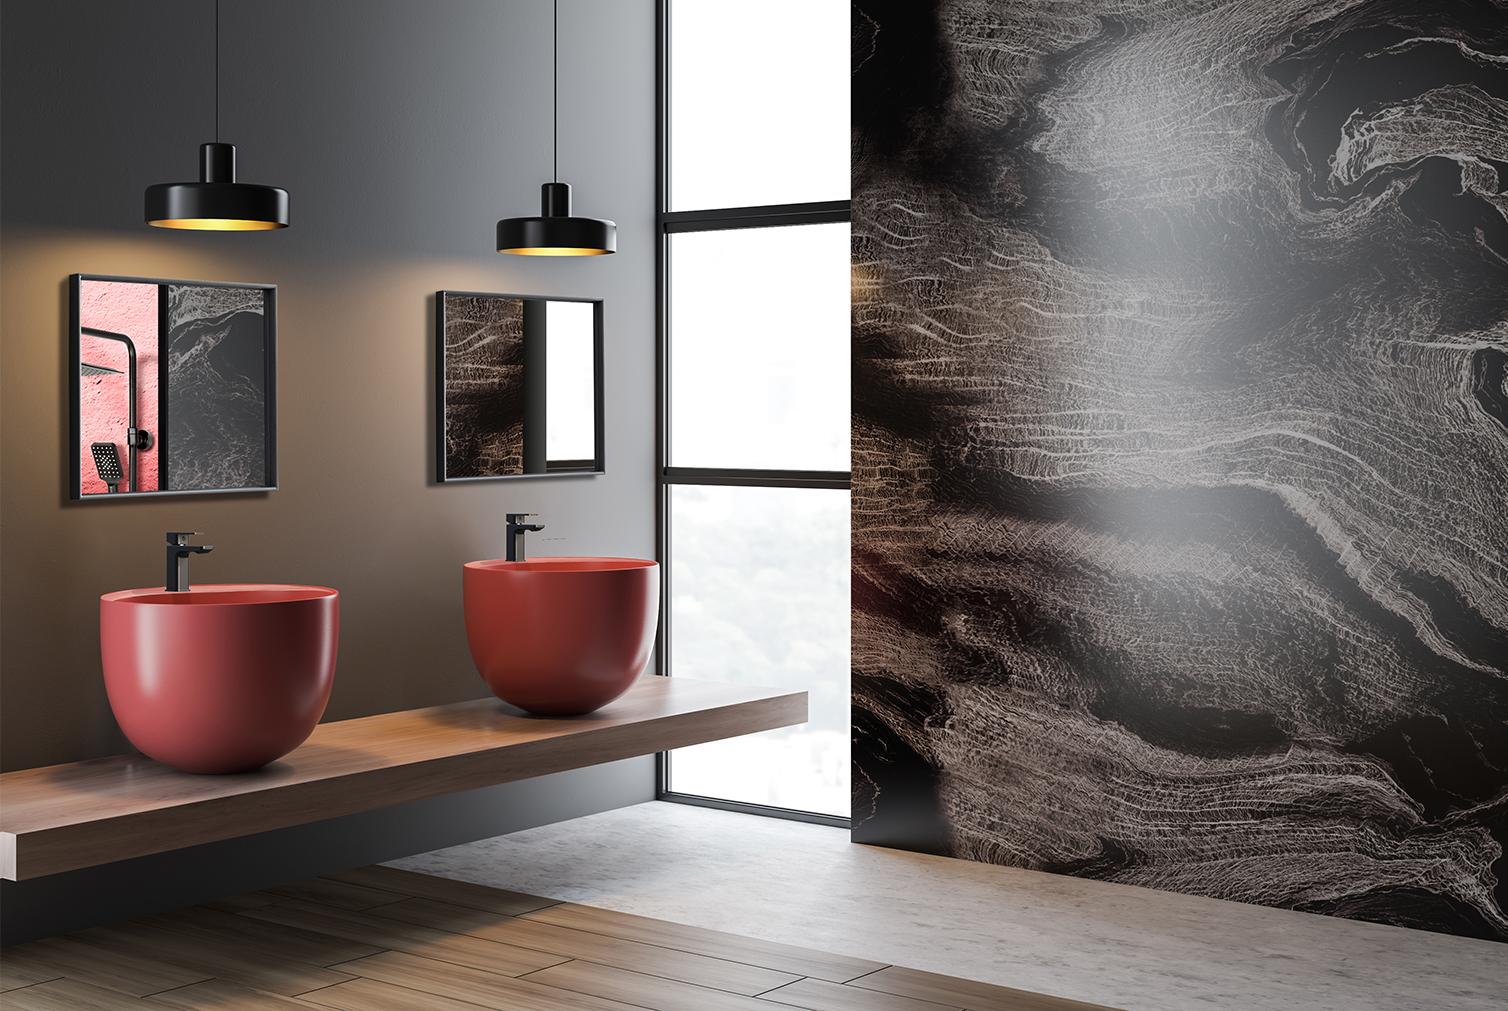 Vysoká umývadlová batéria VICTORIA | LOTOSAN Kúpeľna a Interiér